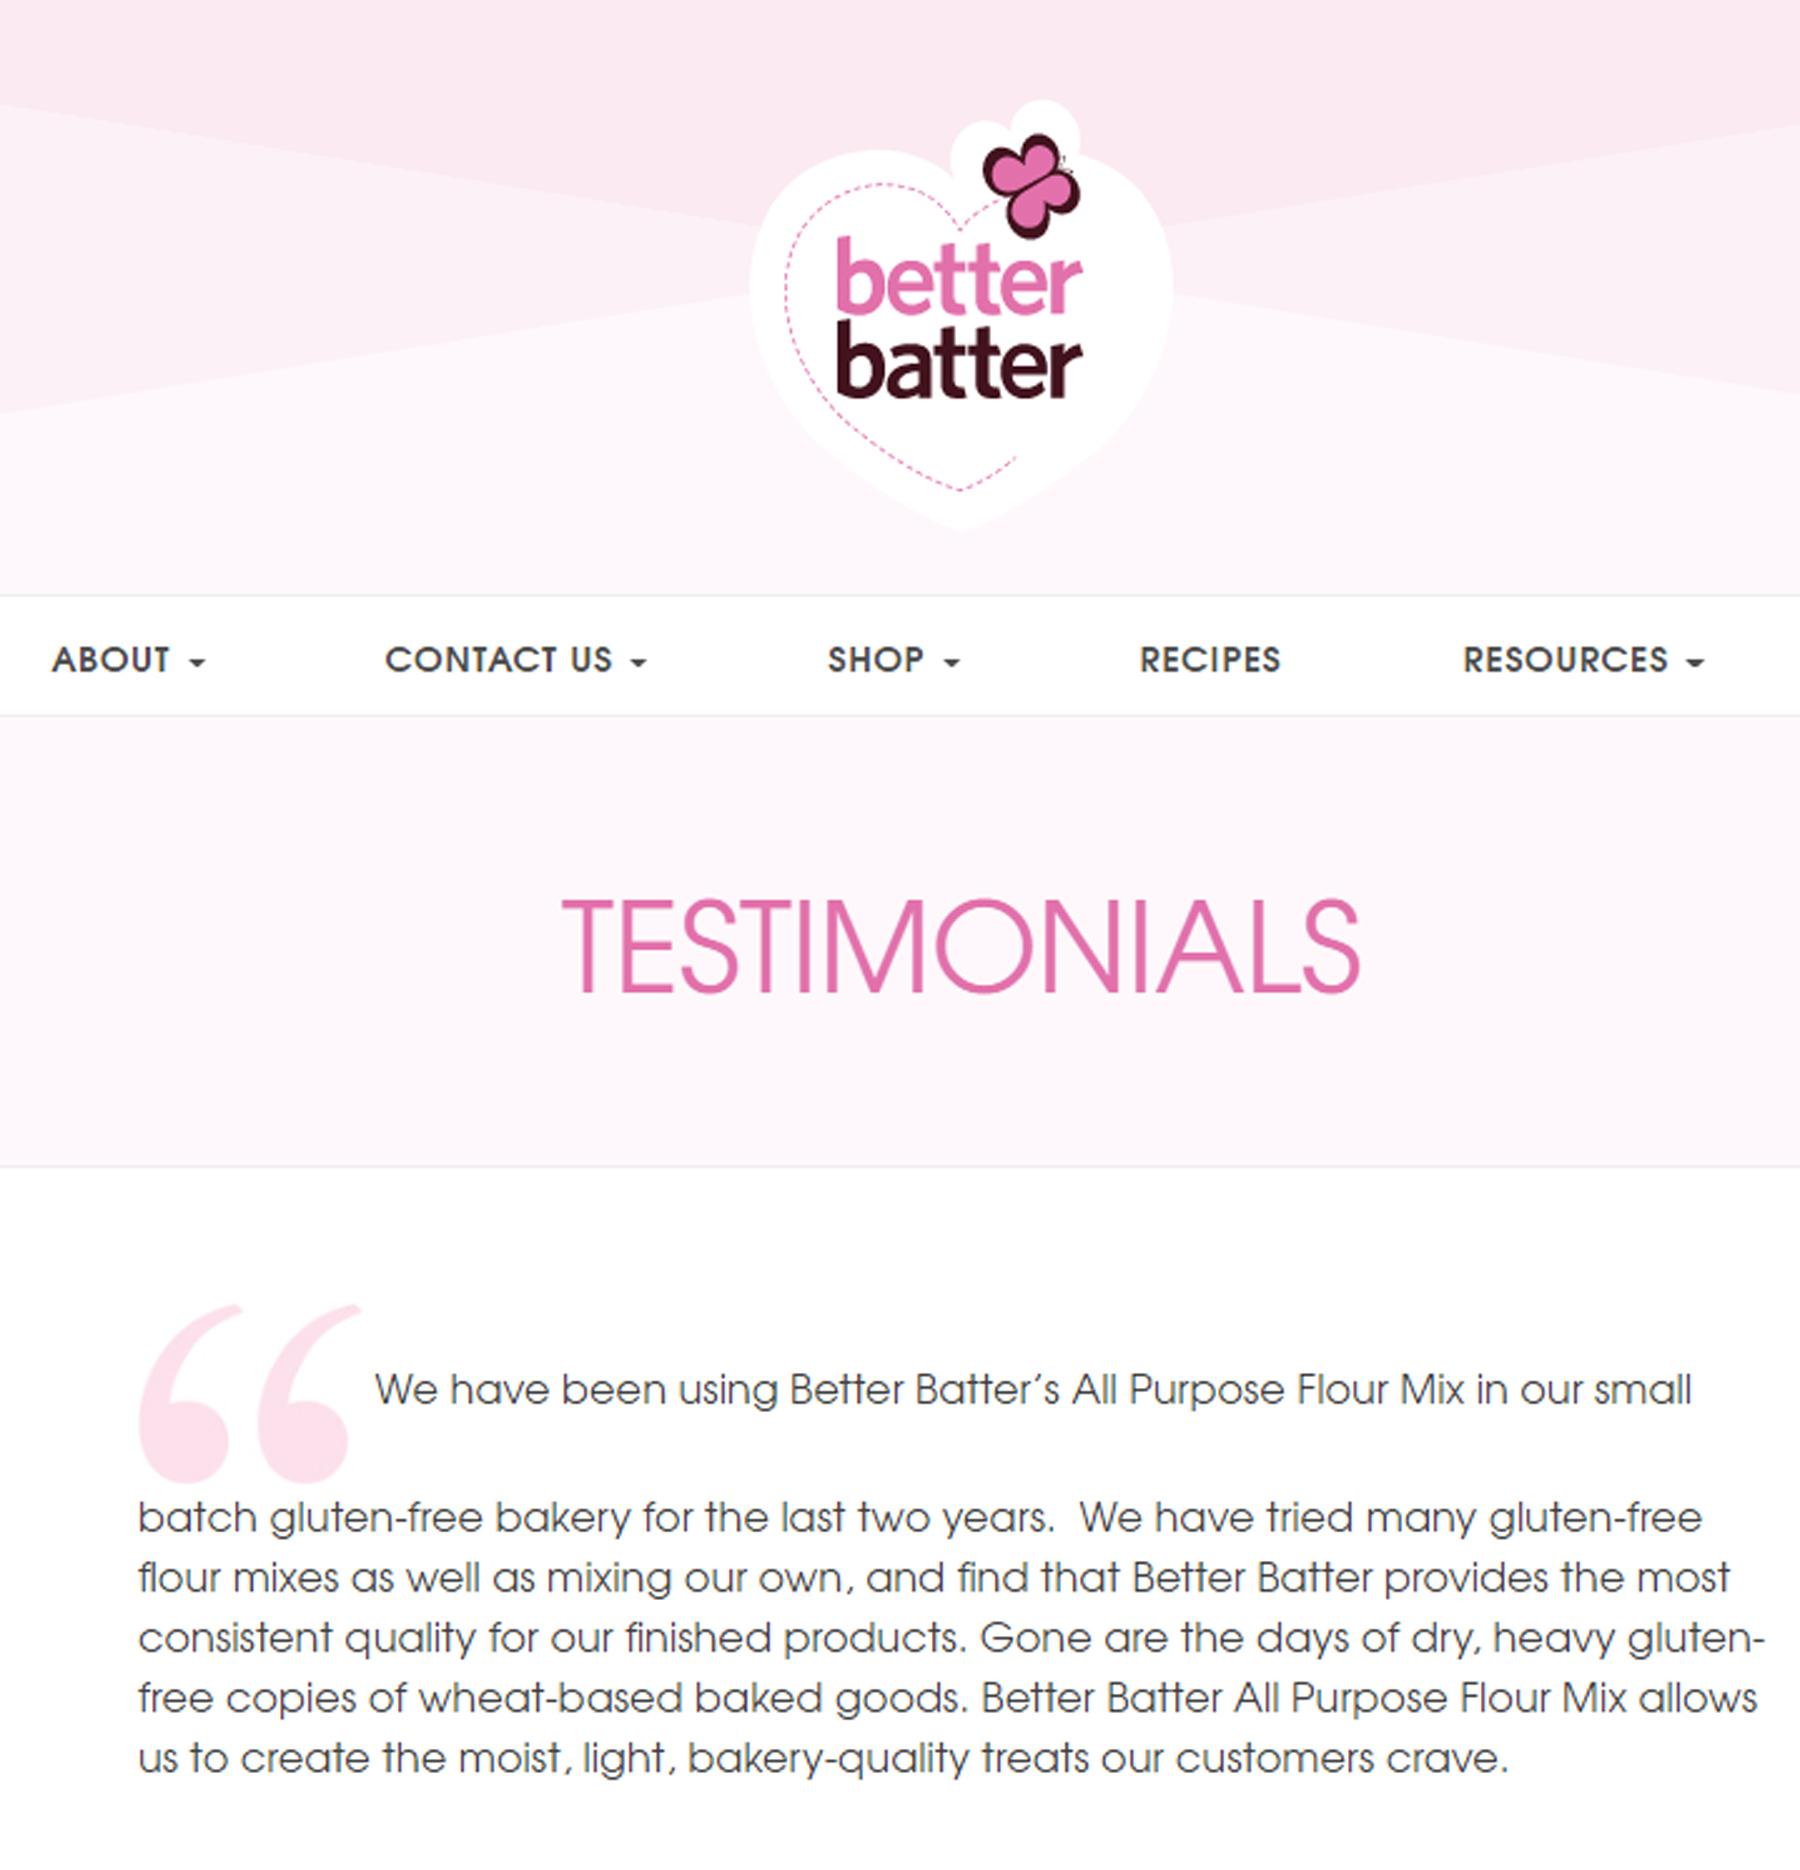 Testimonial evergreen content example: Better Batter